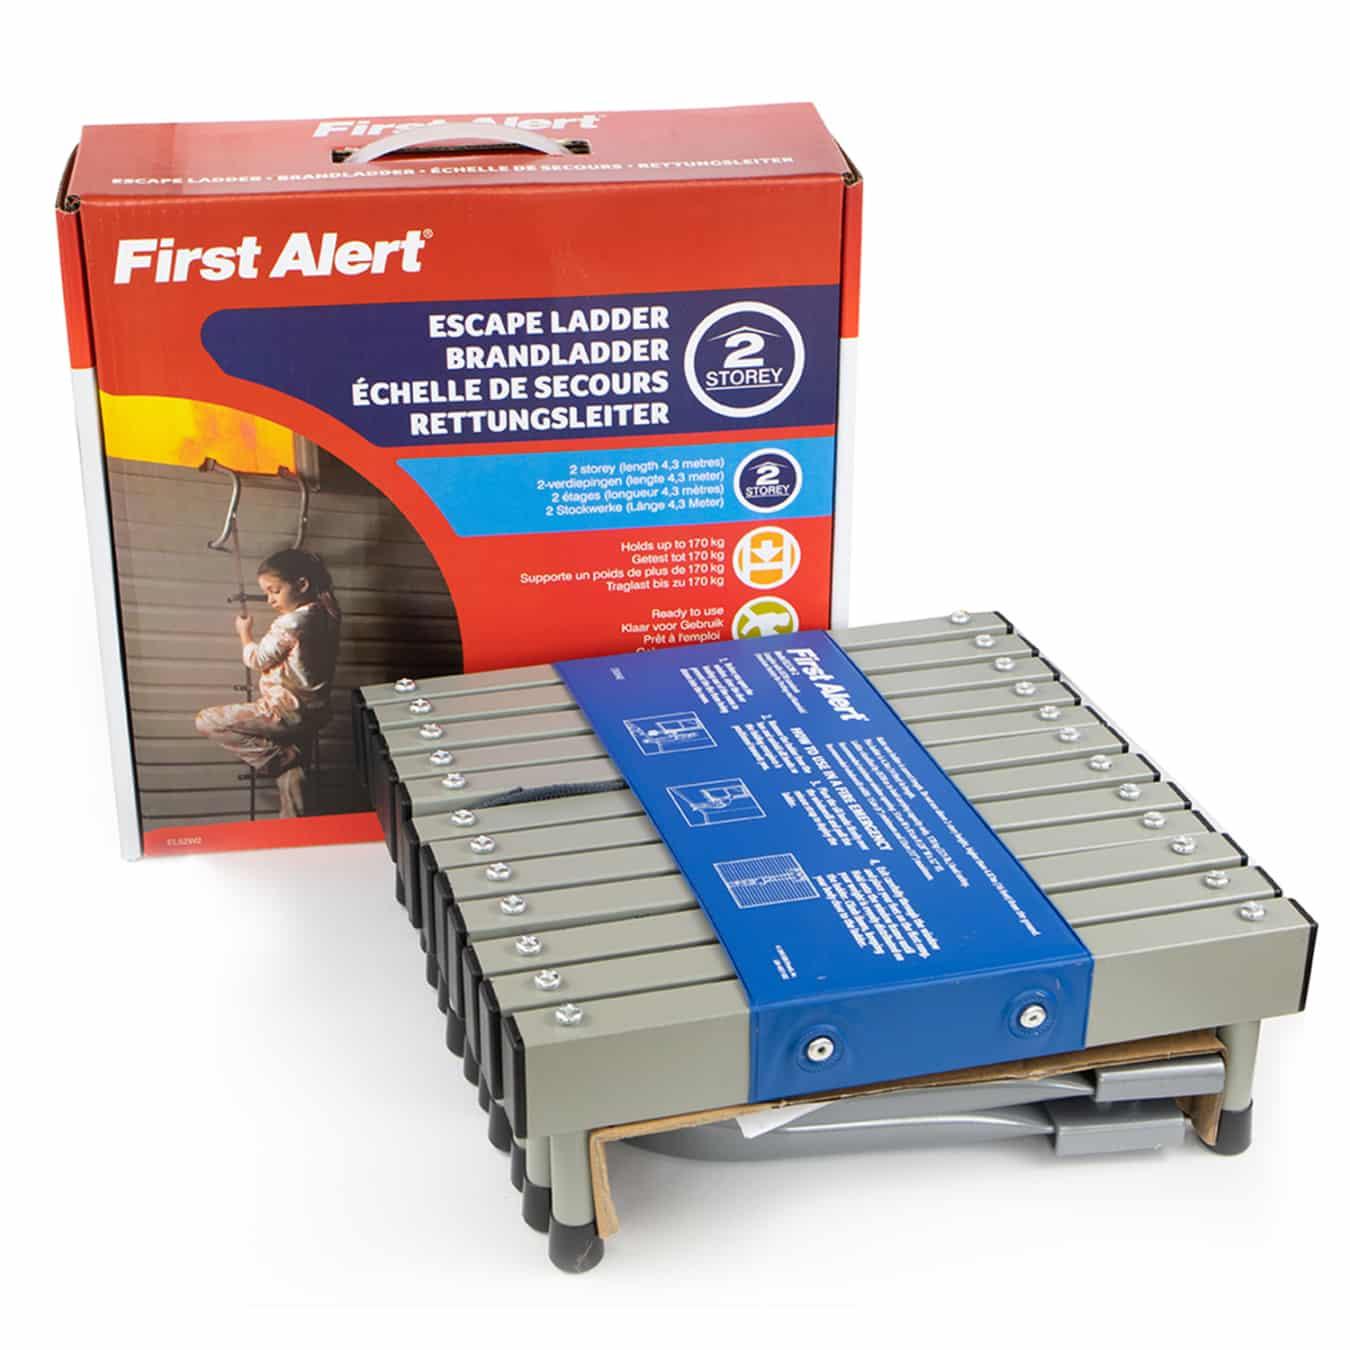 Koop First Alert EL52W-2 Vluchtladder 4,3 mtr